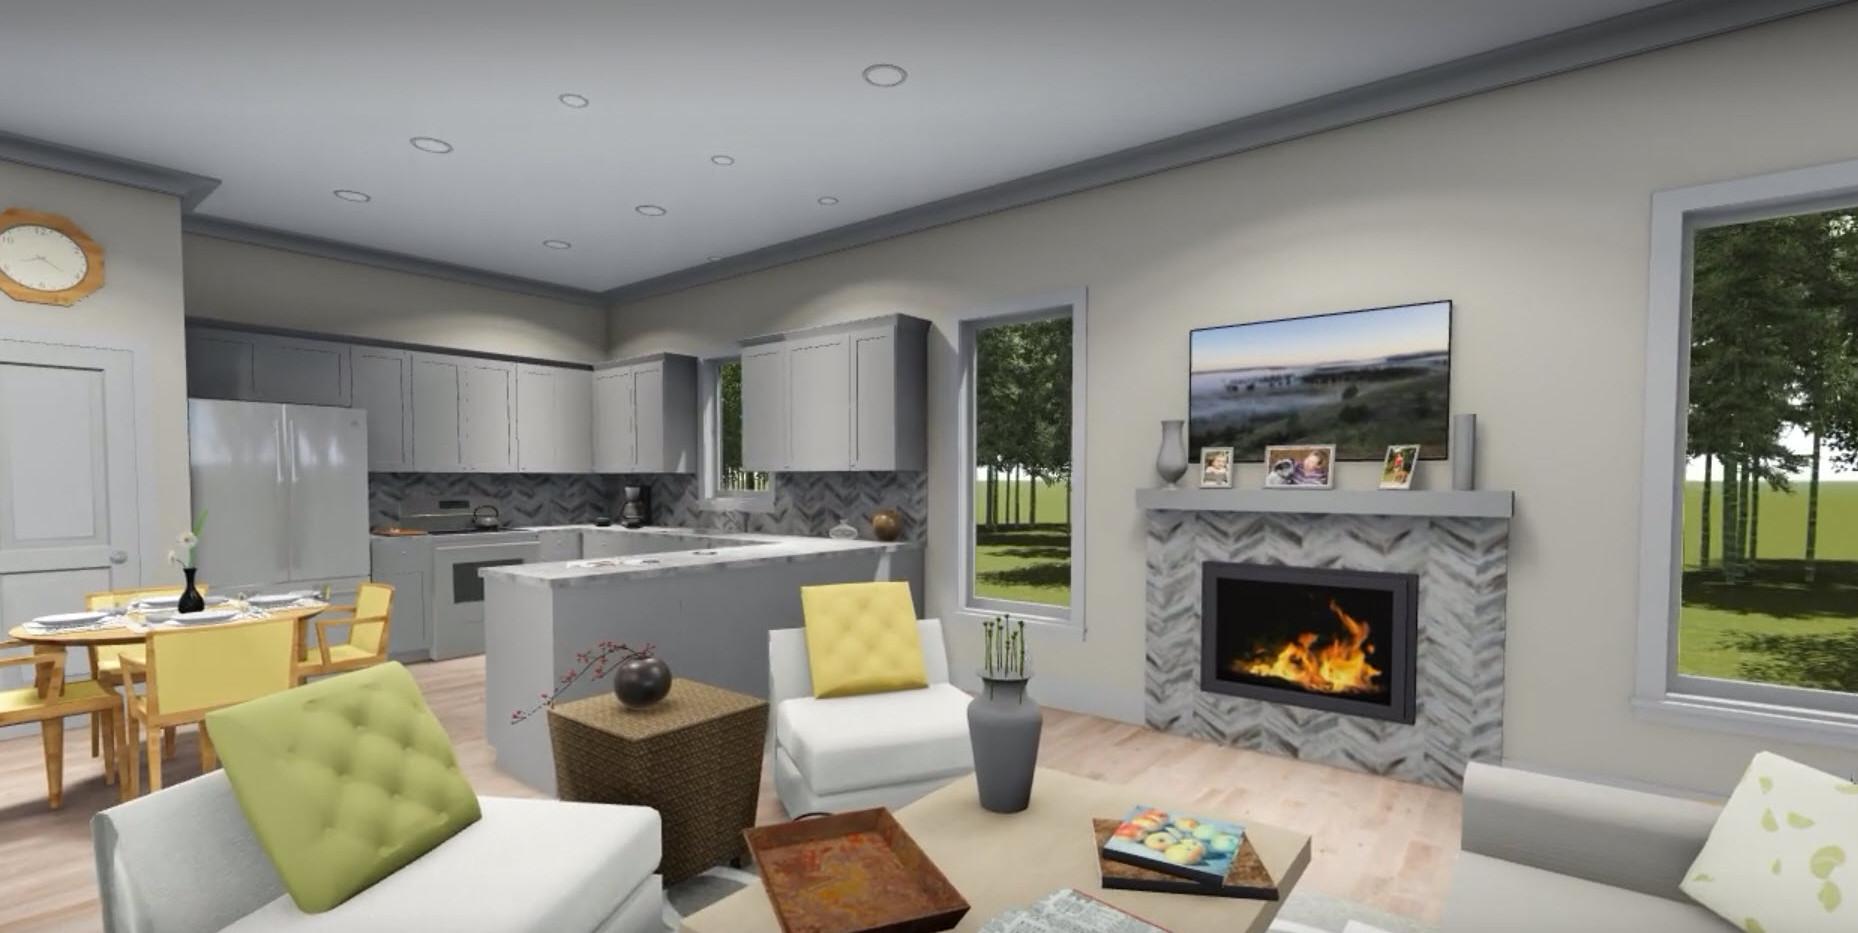 Modern Interior - 2.jpg